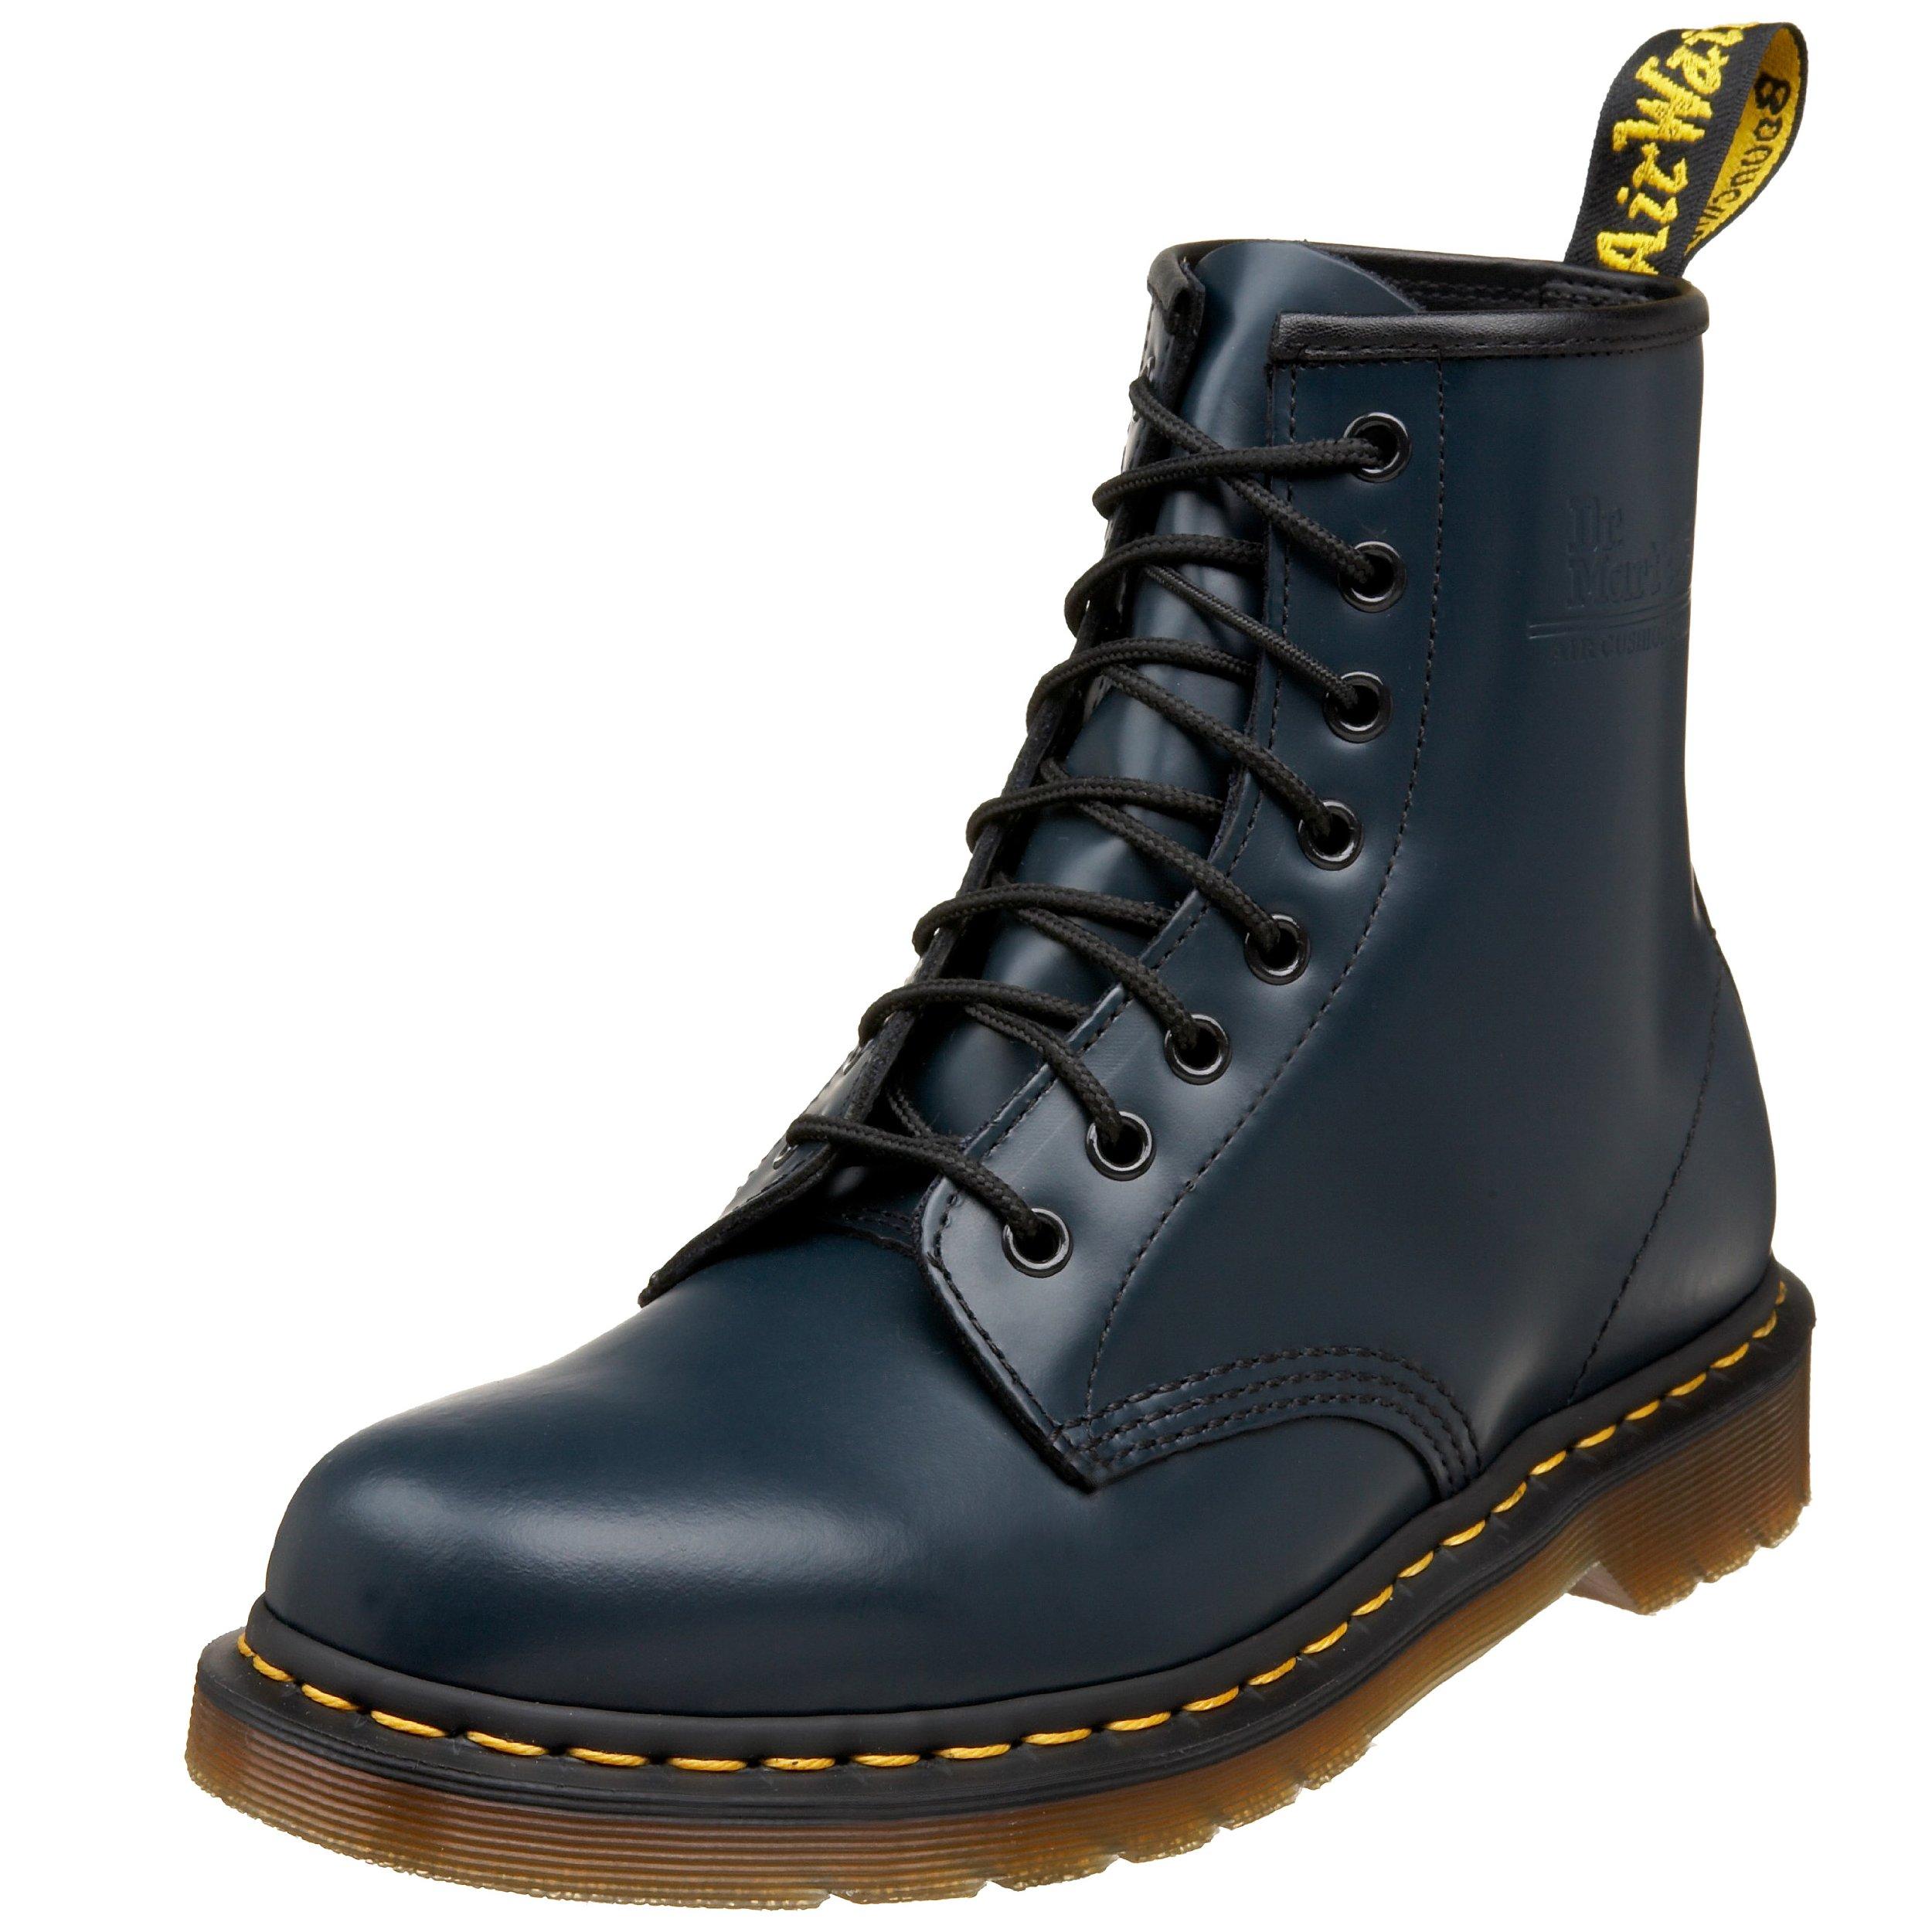 Dr. Martens 1460 Unisex Boot,Navy,13 UK / 14 US Mens / 15 US Womens